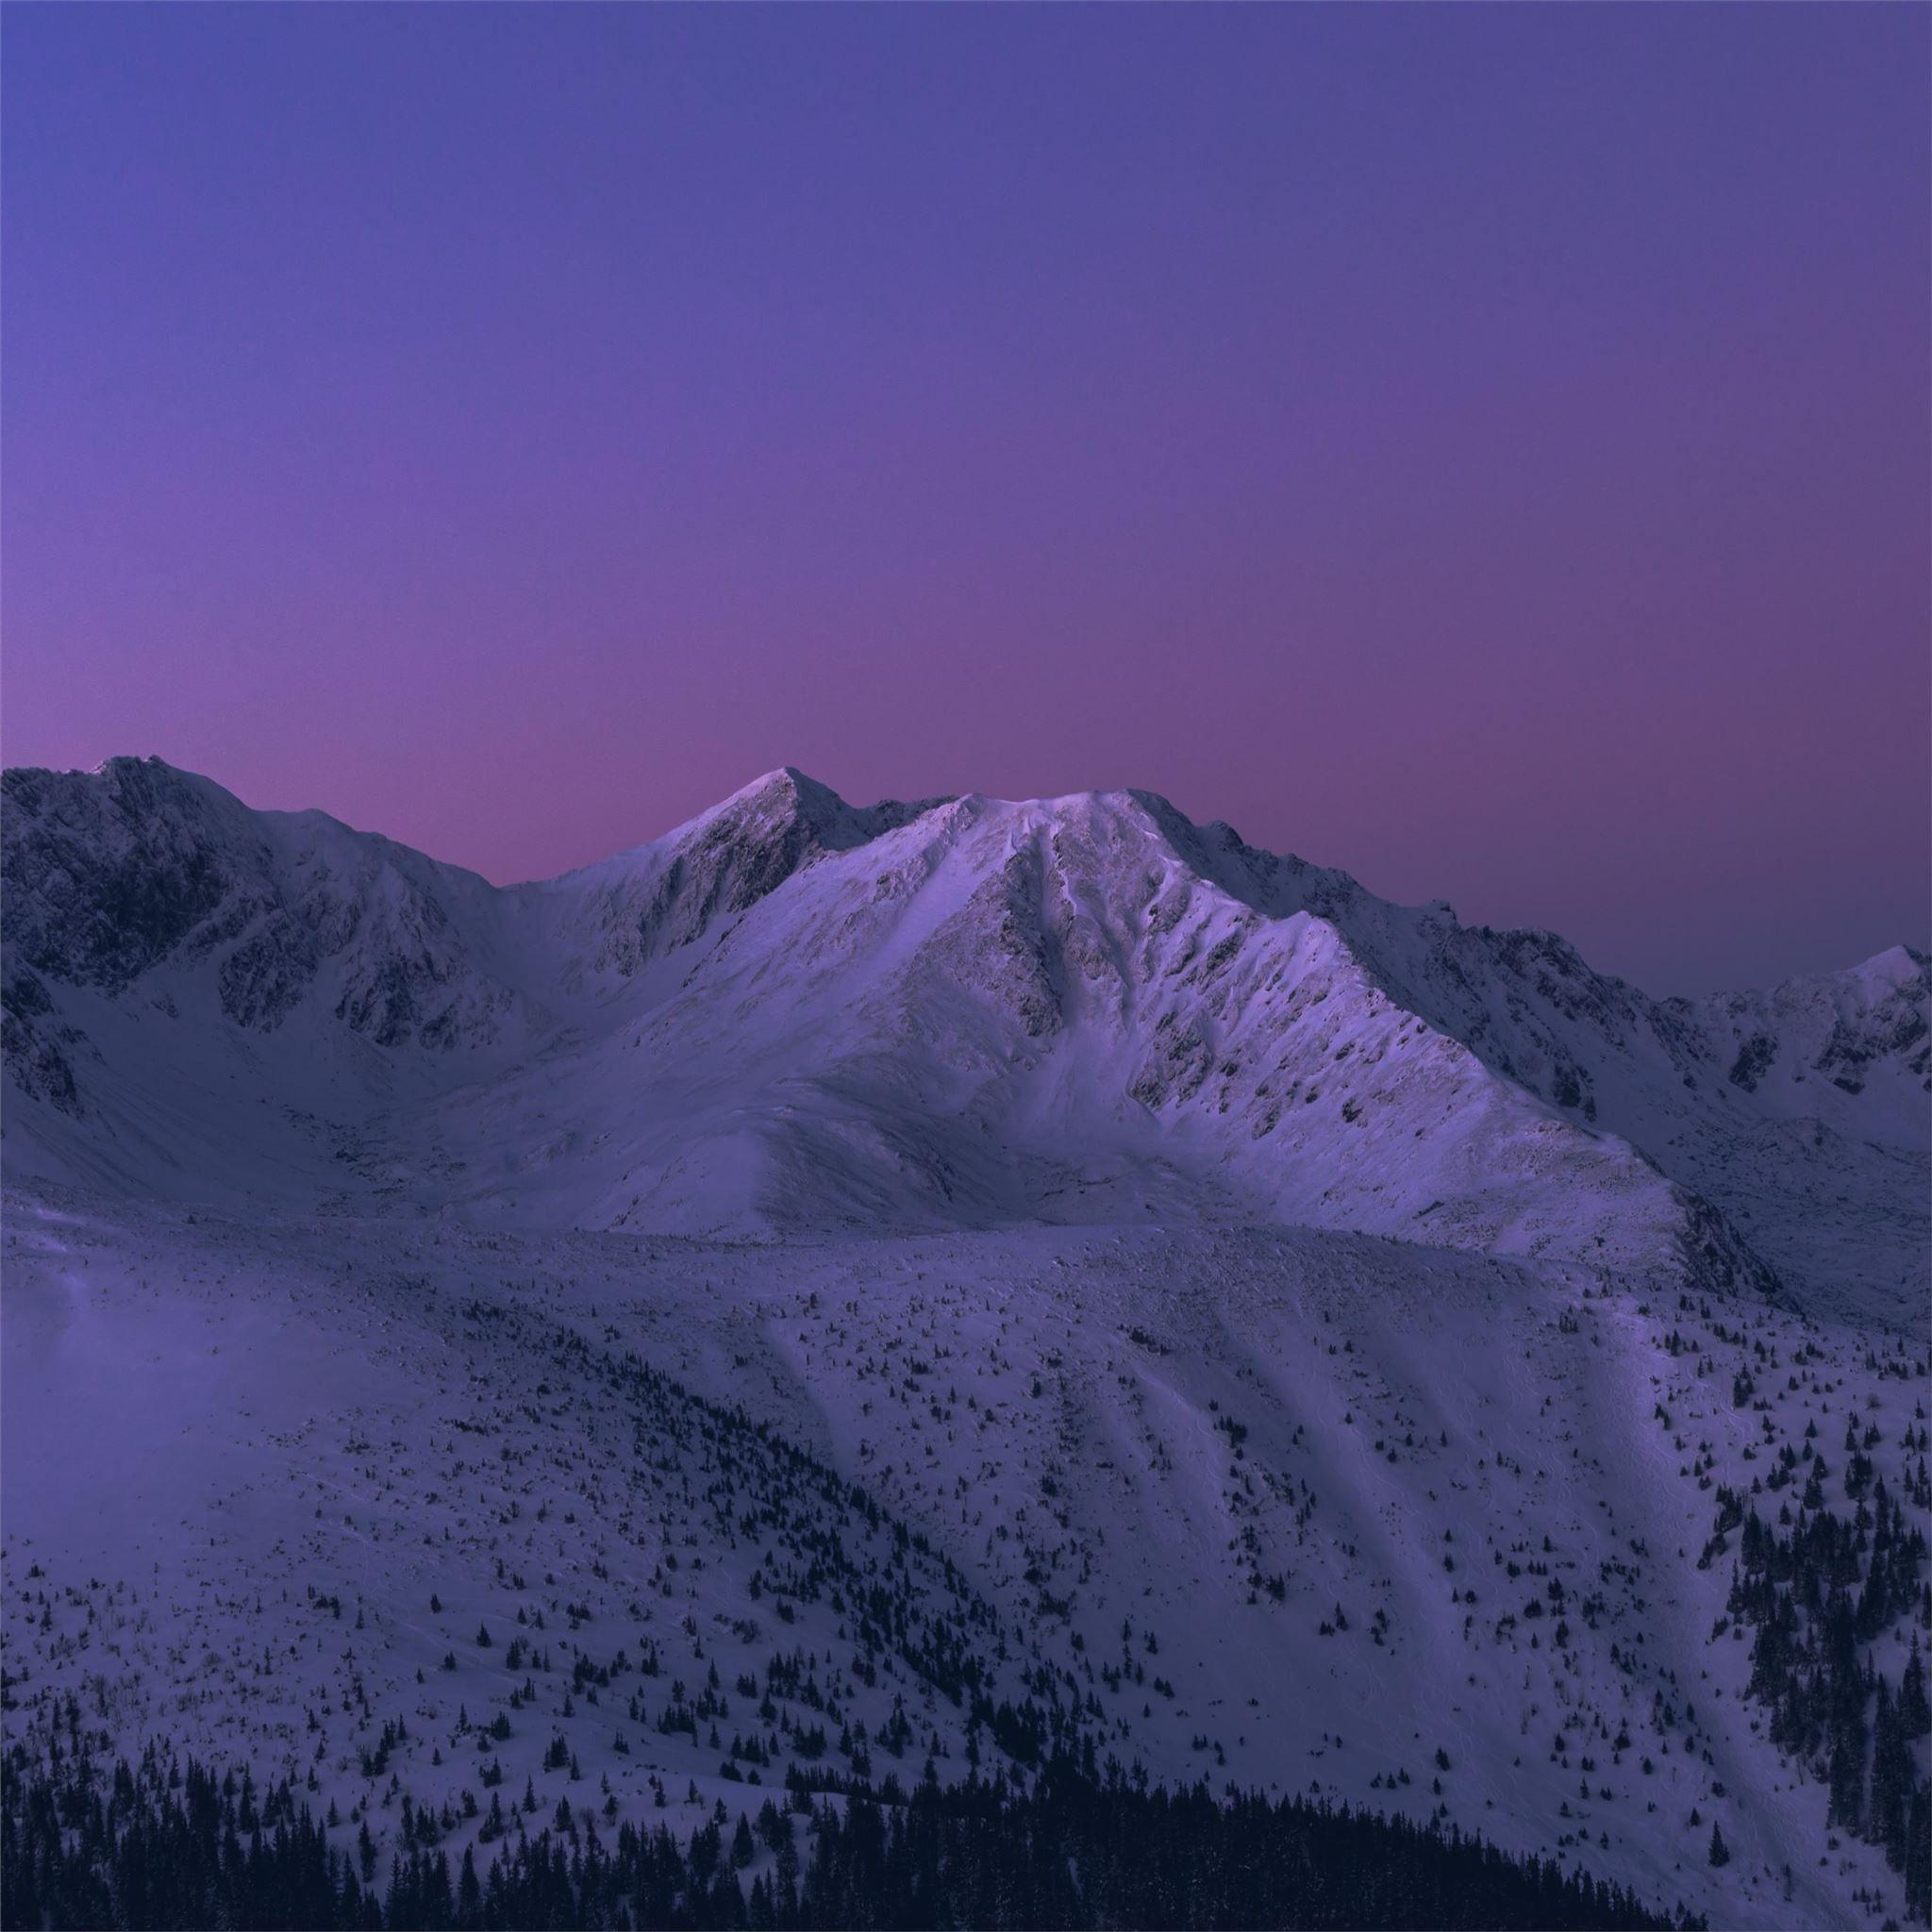 Snow Covered Mountains 4k 5k Mountains Nature 4k 5k Ipad Air Wallpaper Samsung Wallpaper Nature Wallpaper